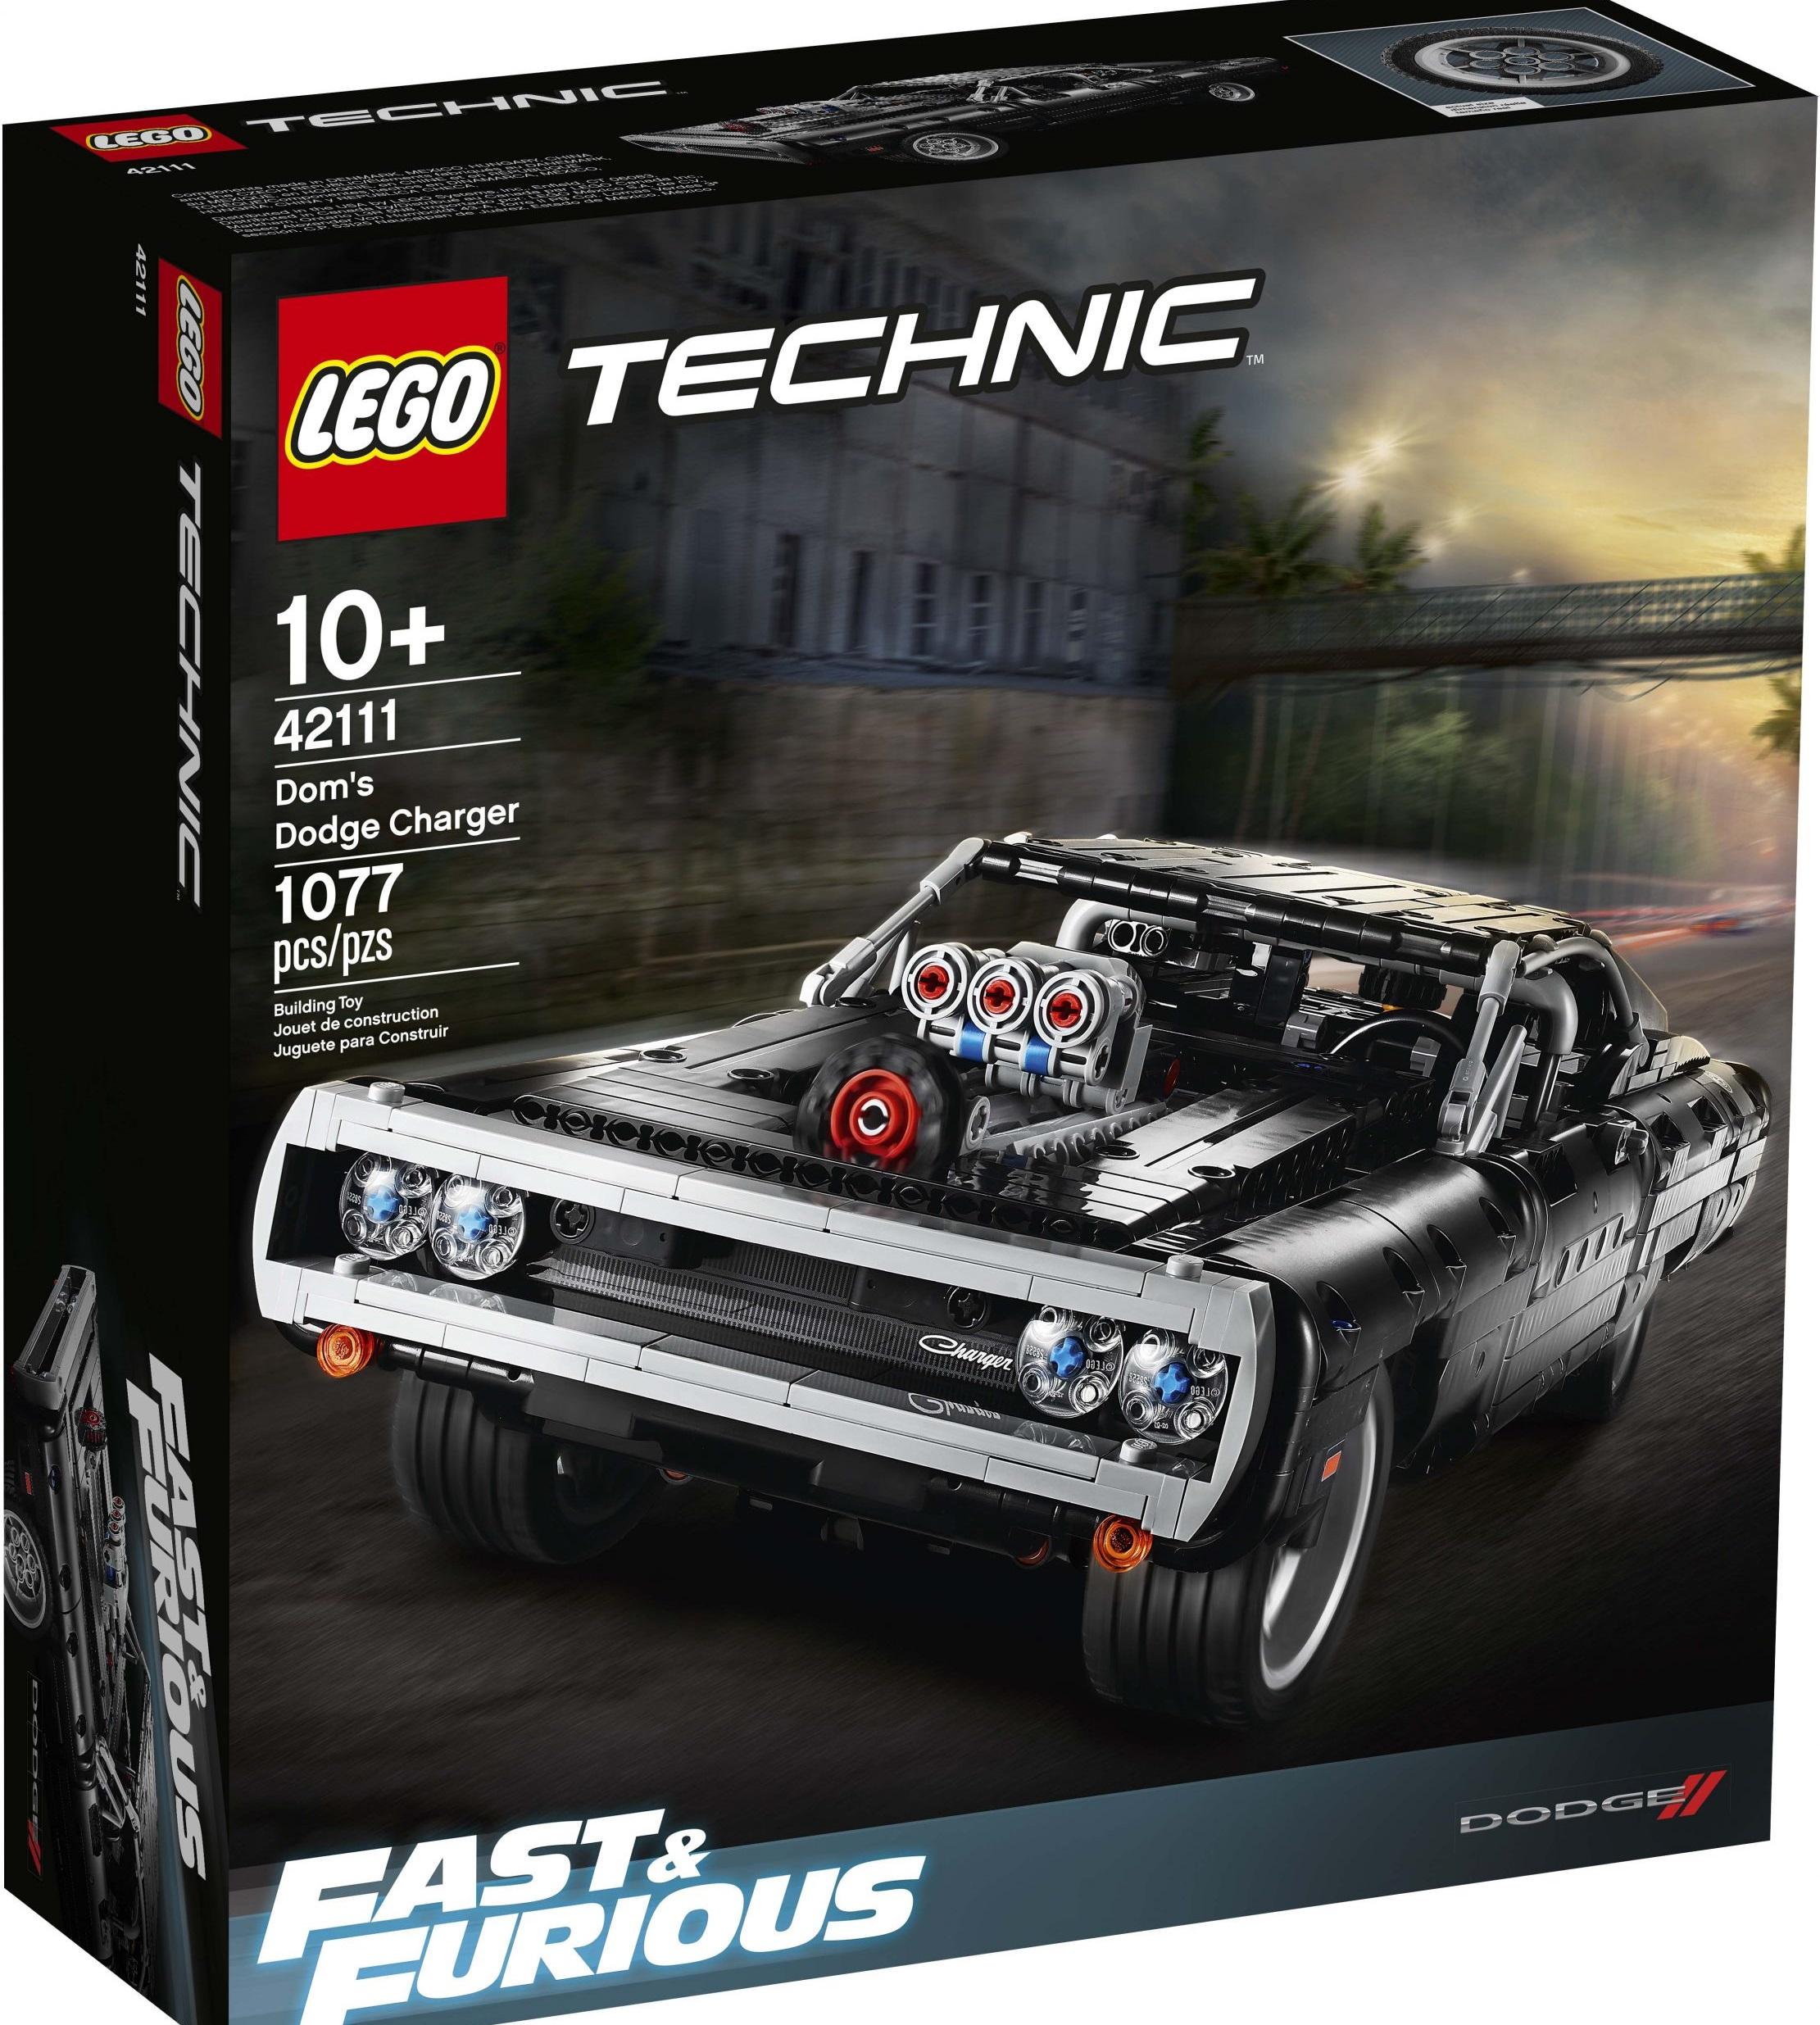 LEGO Dom Toretto's Dodge Charger technic